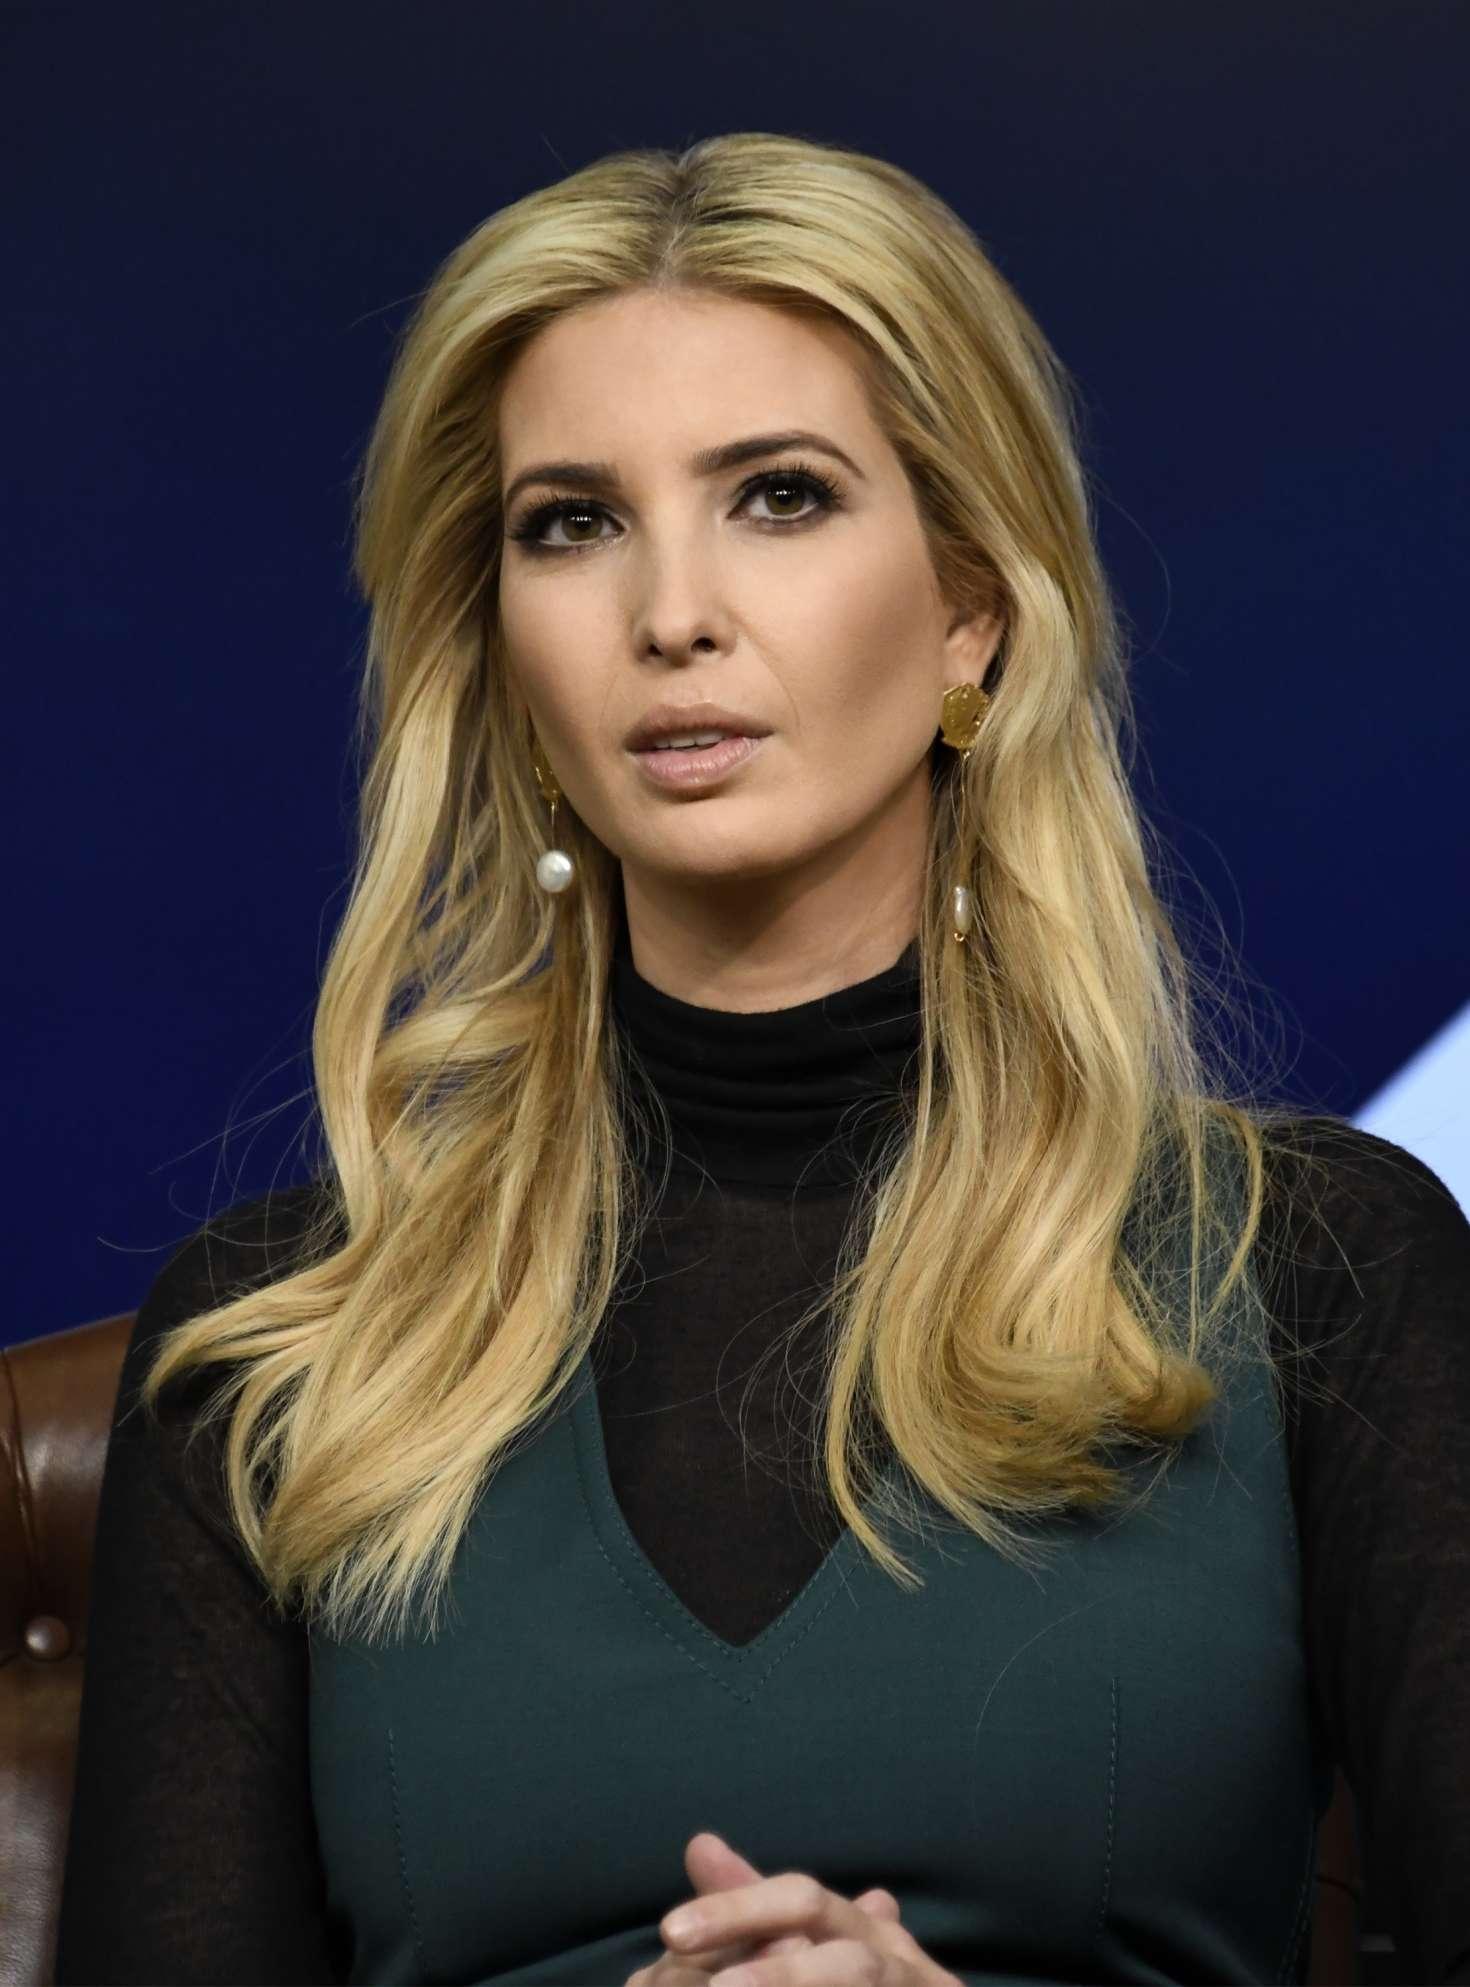 Ivanka Trump 2018 : Ivanka Trump: Generation Next: A White House Forum -18